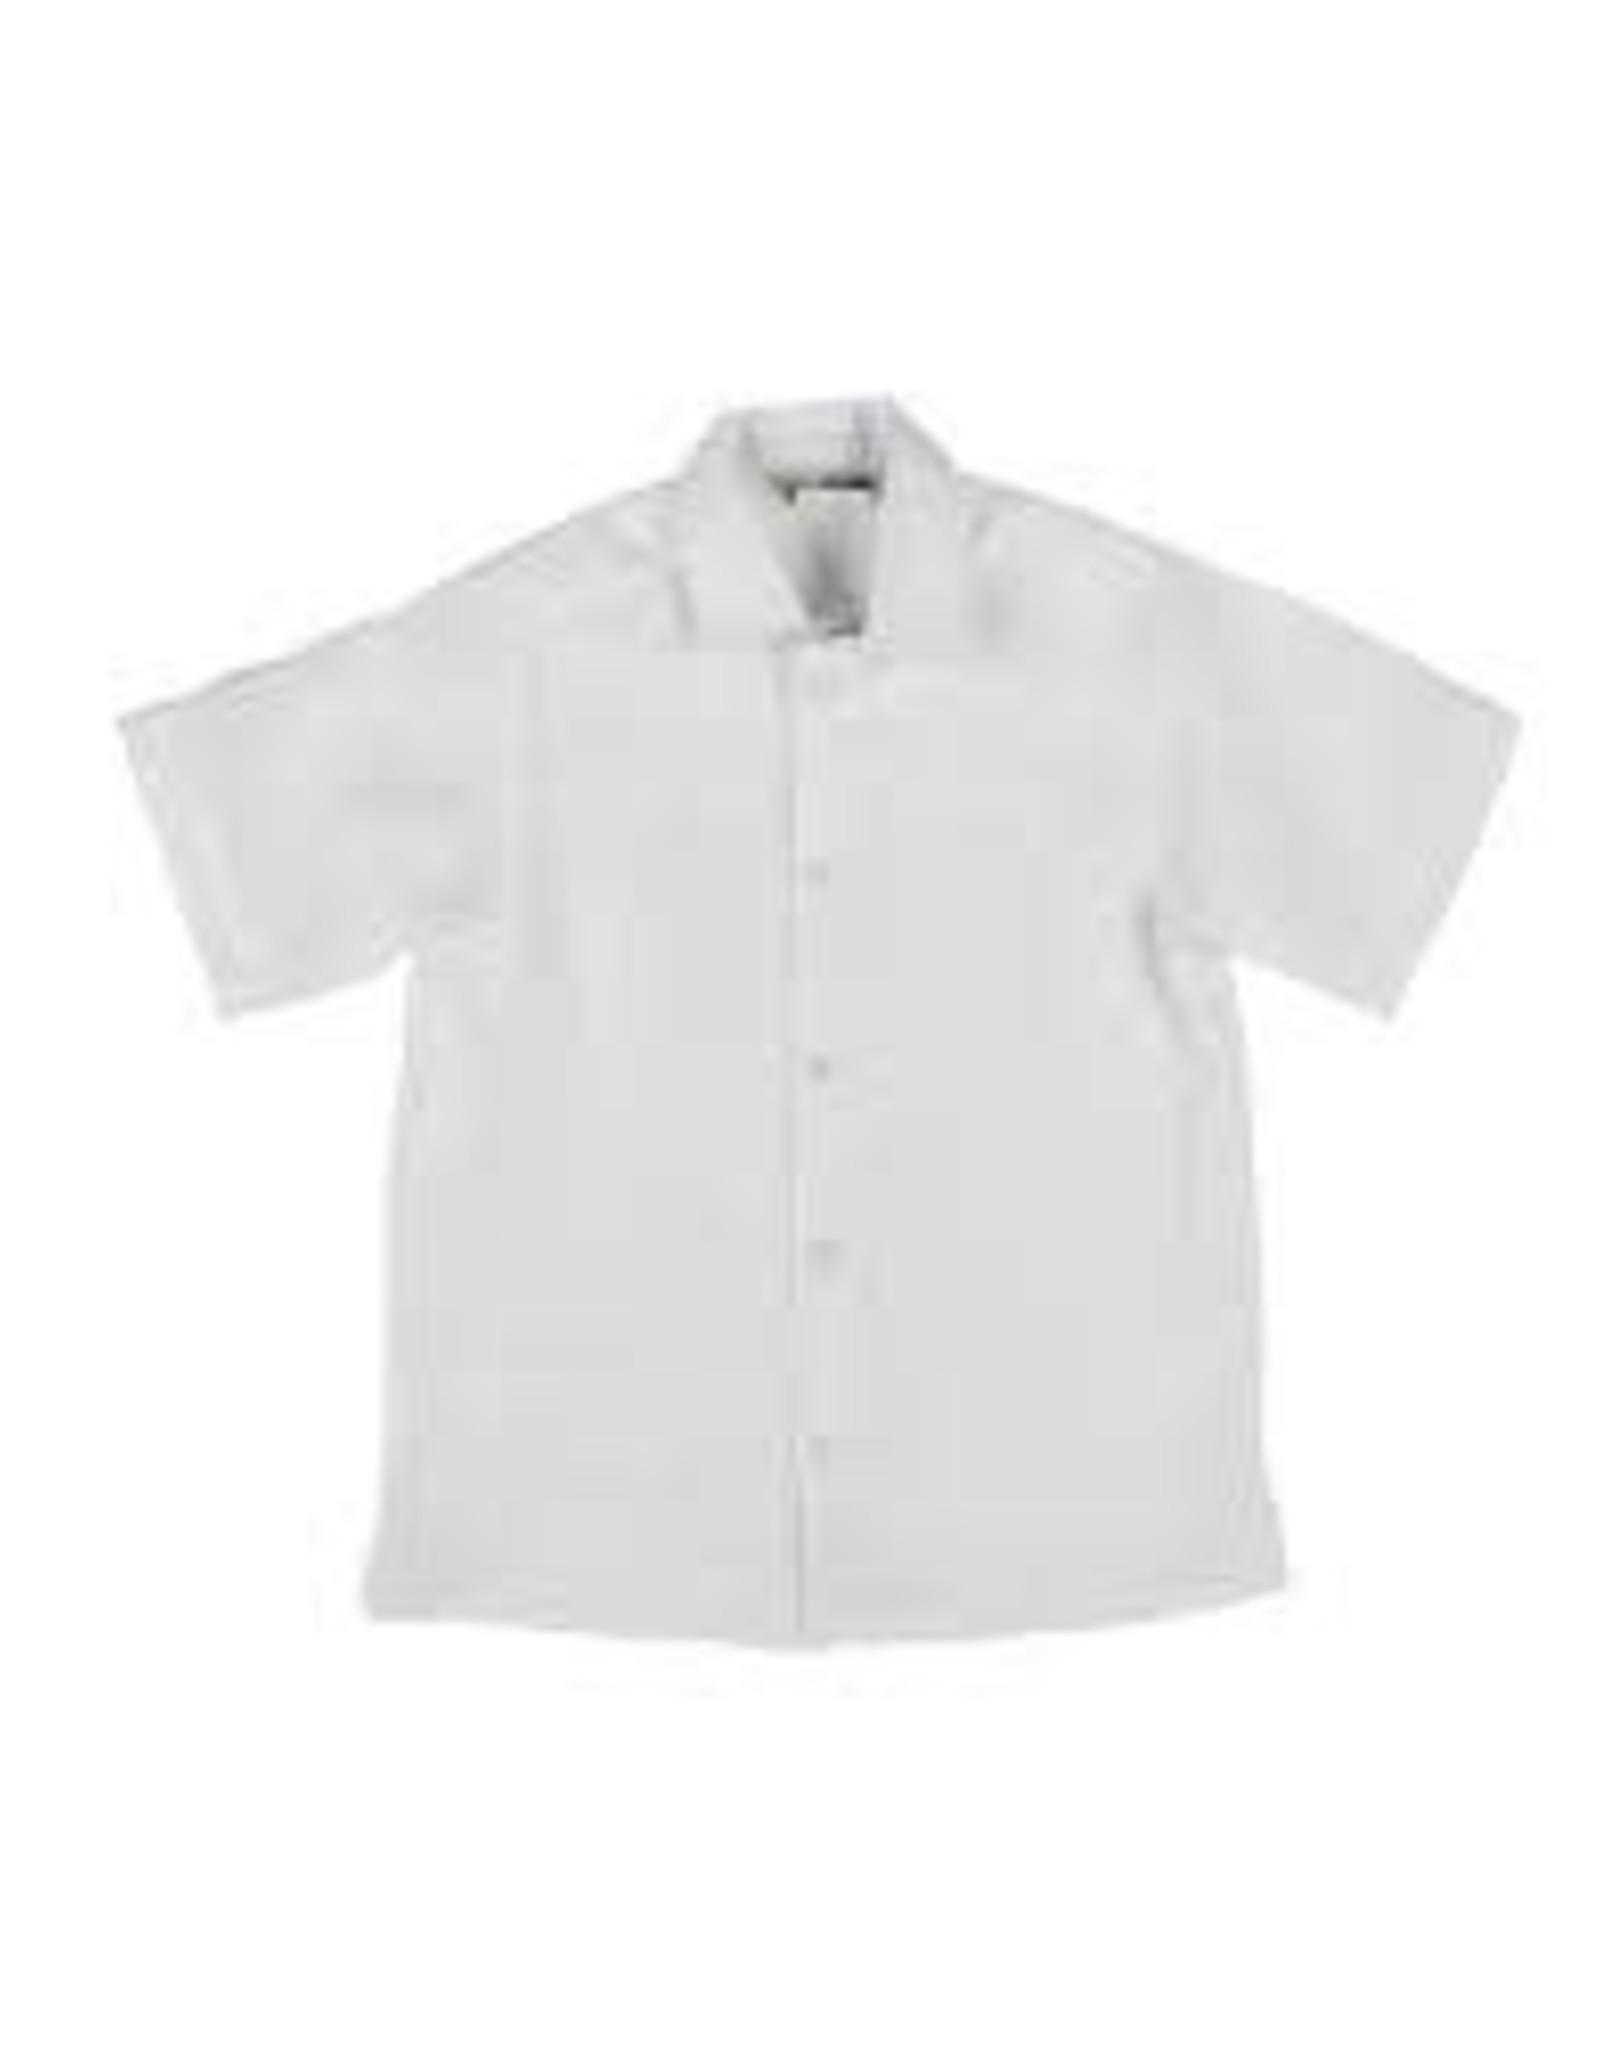 Florence Eiseman White Linen Camp Shirt